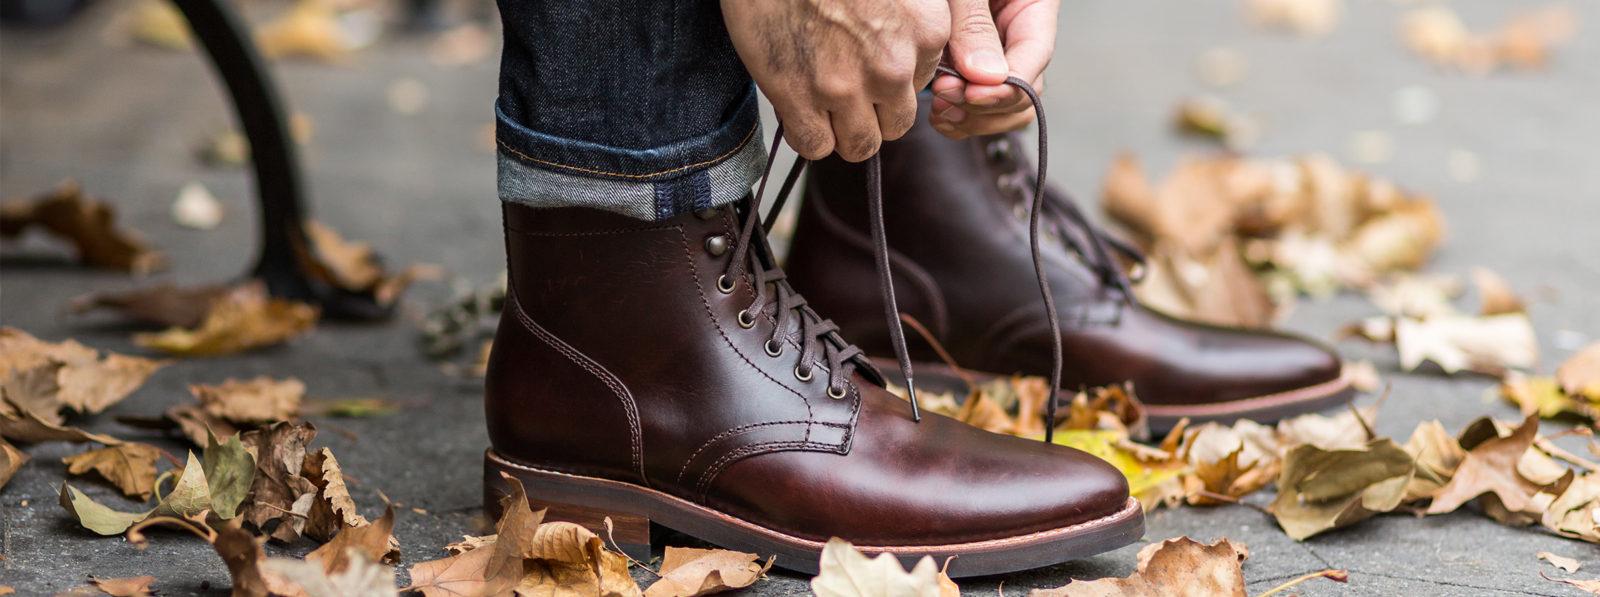 What Makes Thursday Boots a Smart